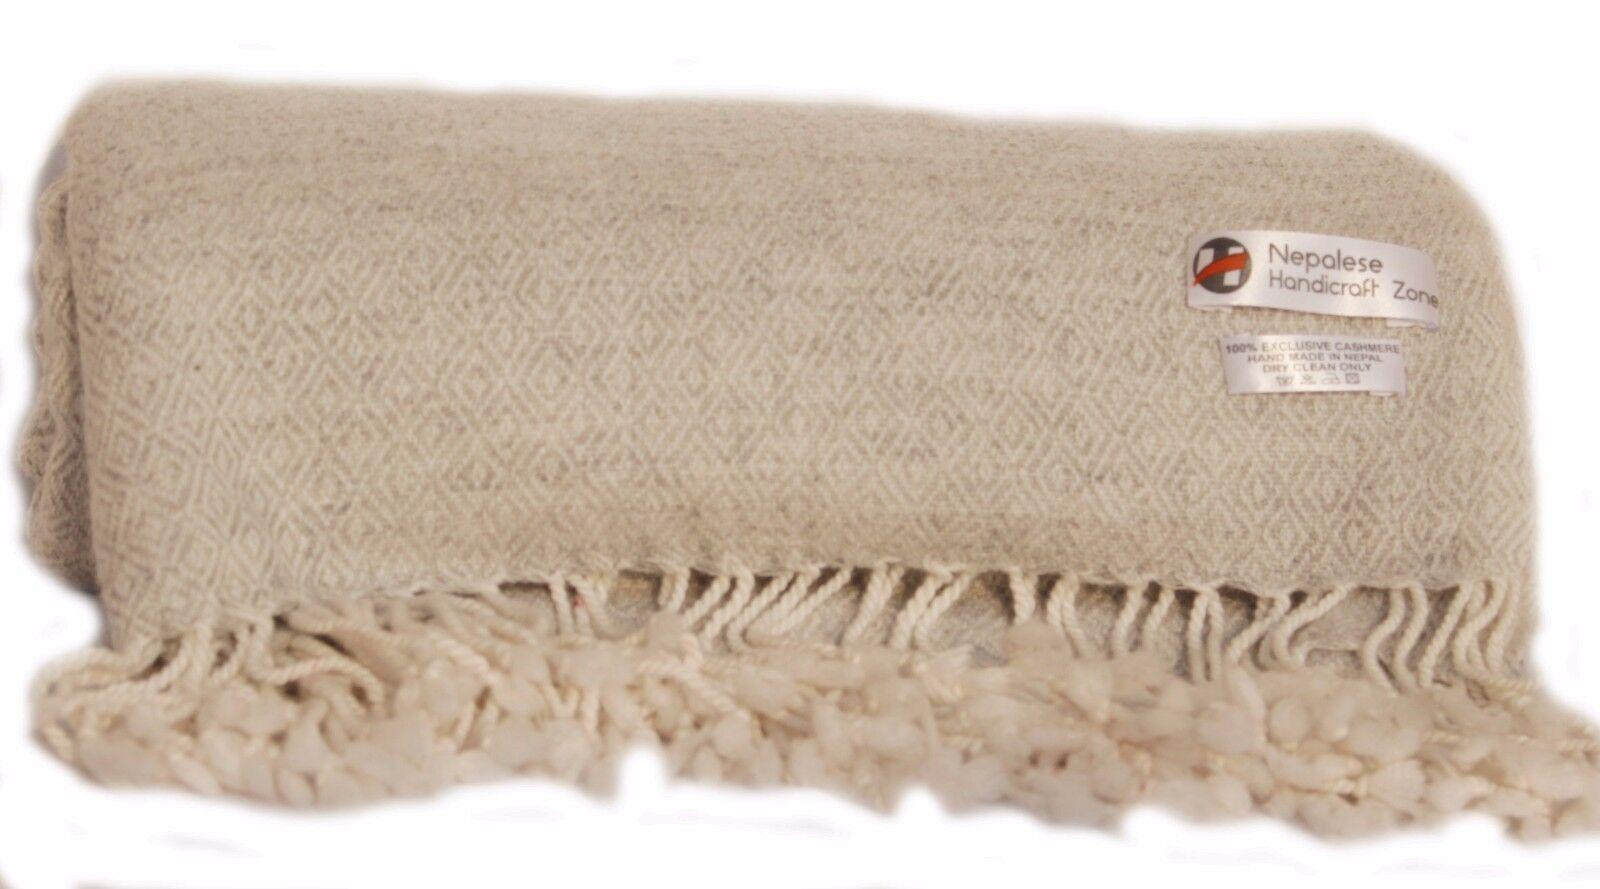 100% Natural Cashmere Blanket, Himalayan Pashmina Throw, Hand Made in Nepal